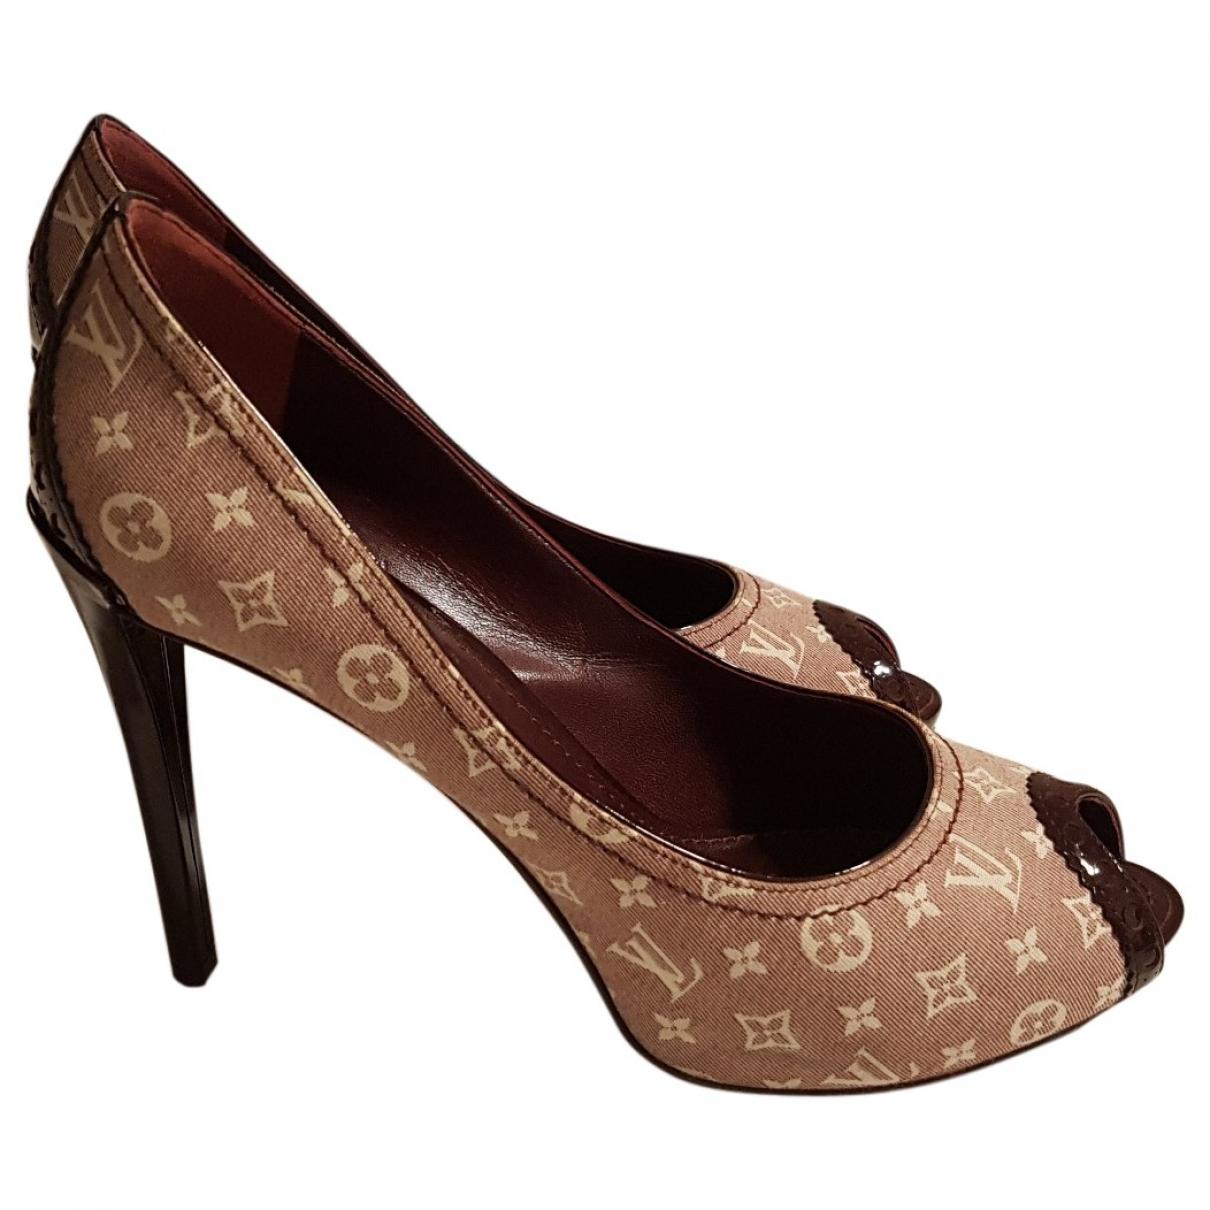 Louis Vuitton \N Burgundy Cloth Heels for Women 37.5 EU